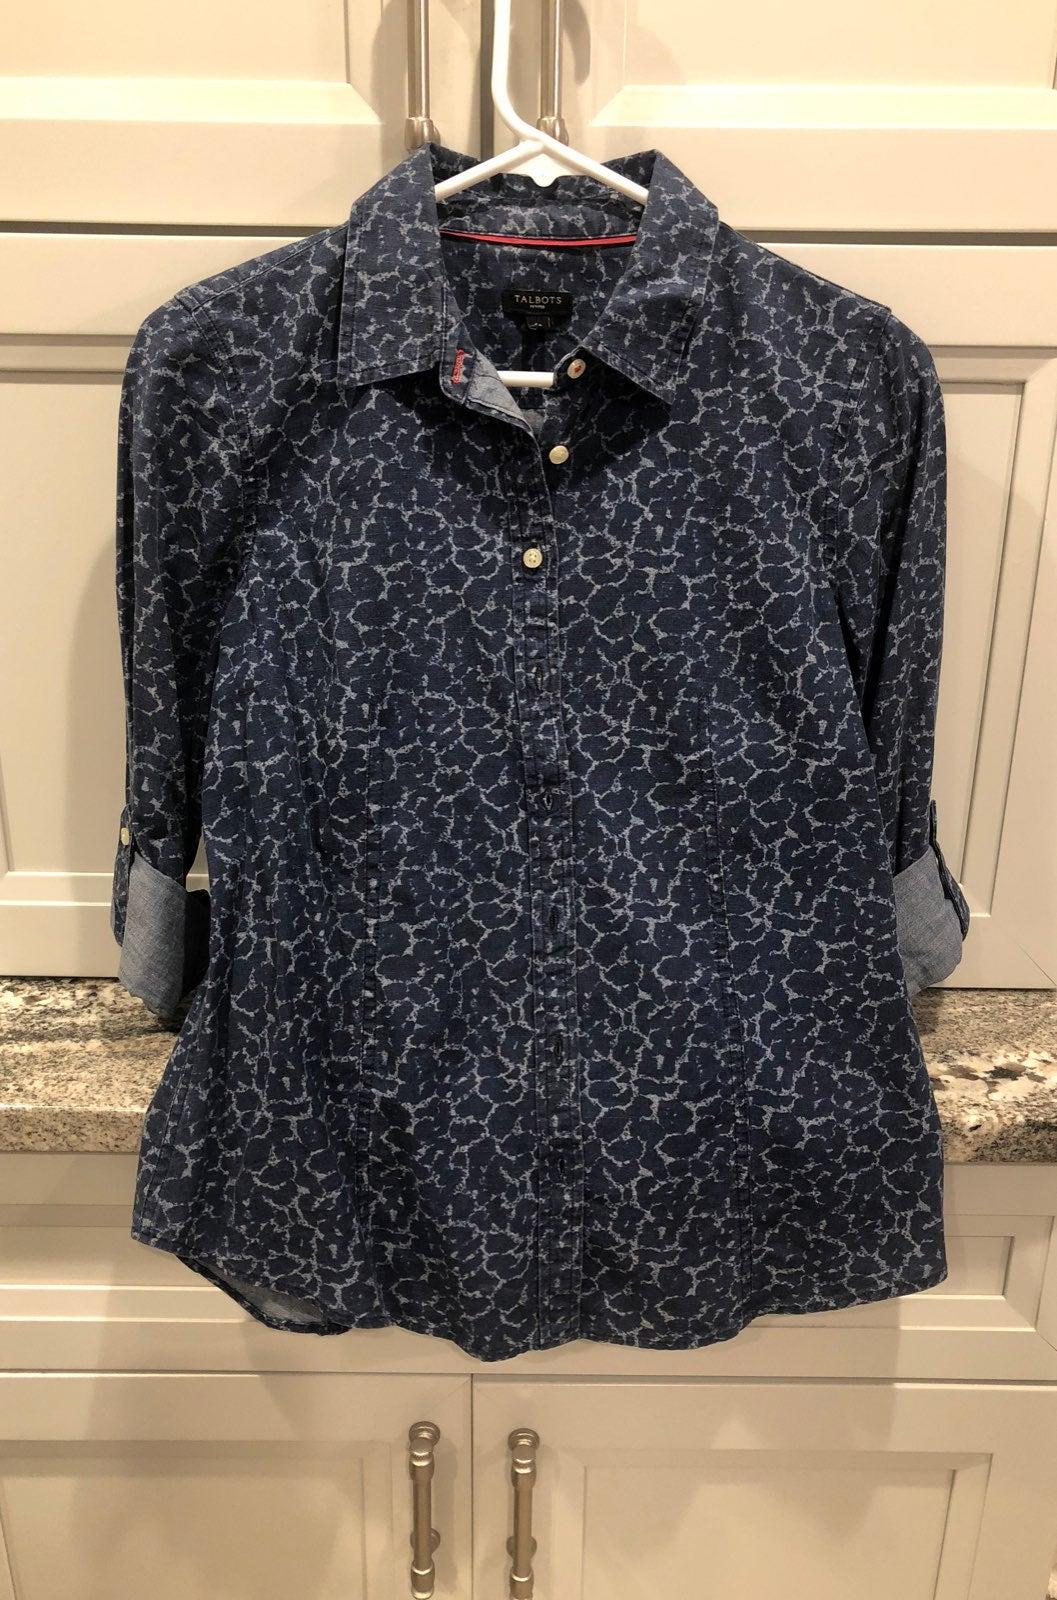 Talbots denium style shirt